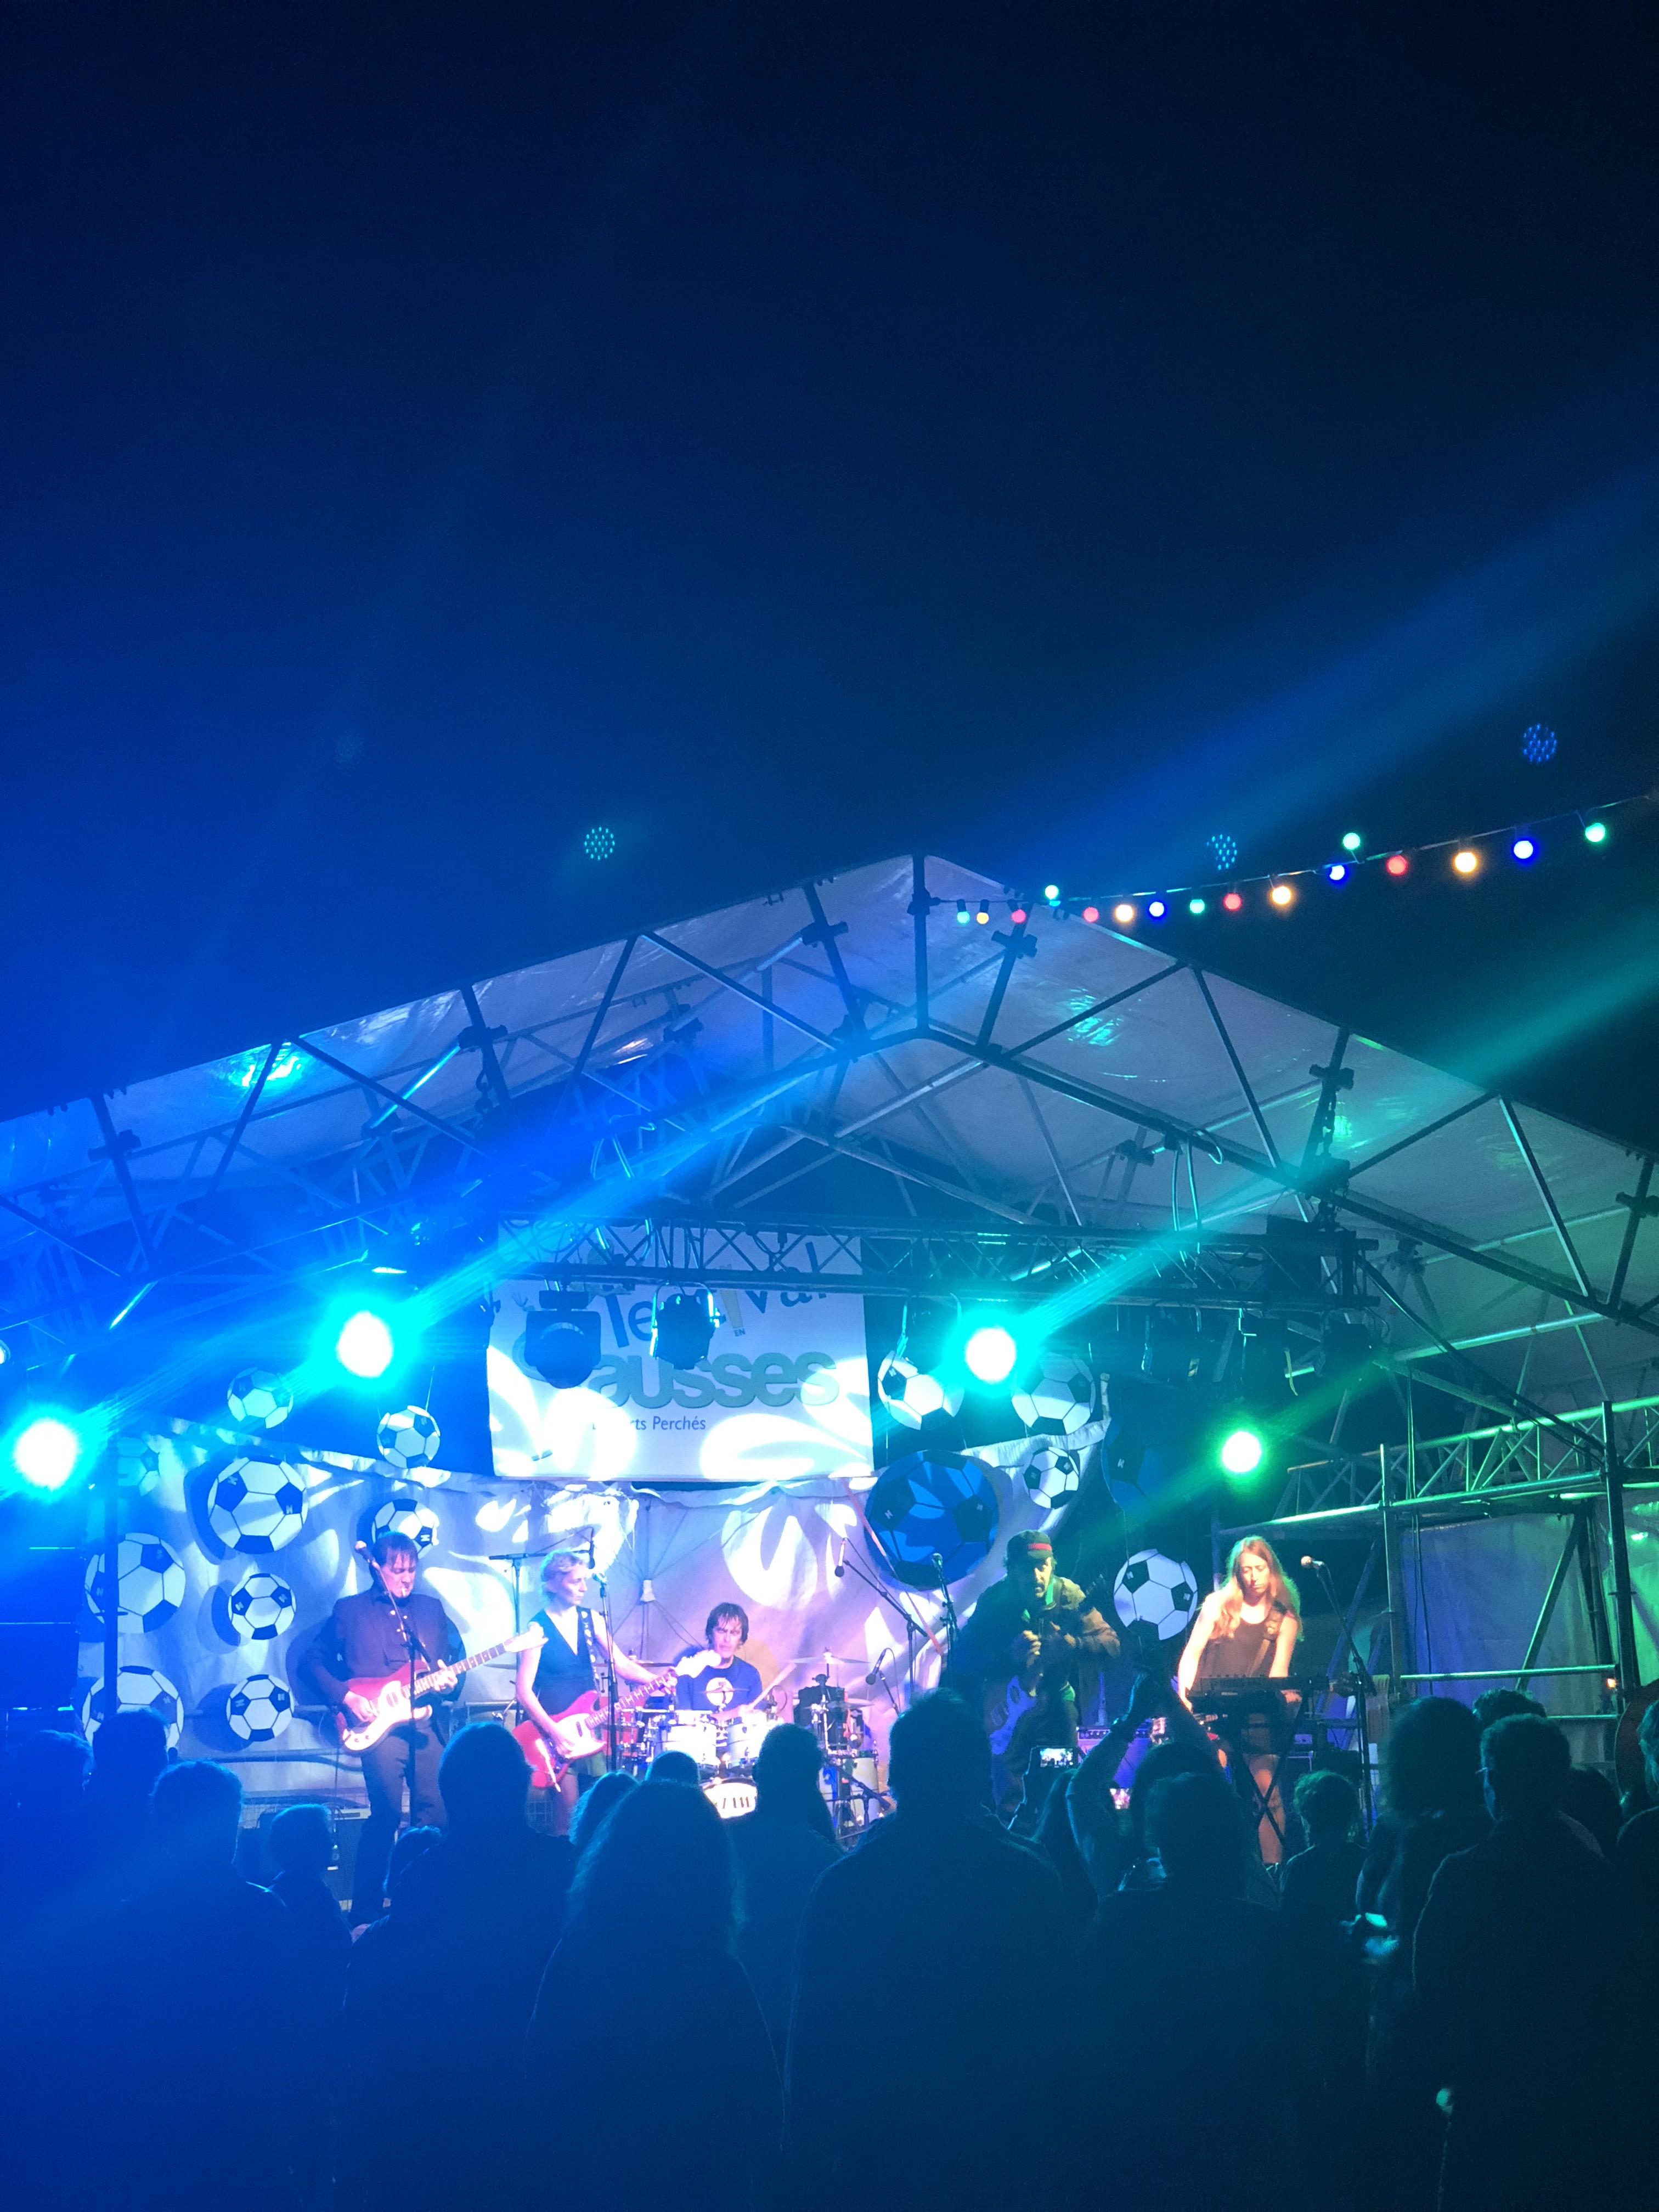 aucop-event-festival-festival en sausses-sonorisation-eclairage-cali-kolinka-dahan-scene-audiovisuel-evenementiel-alpes de haute provence-carros-nice